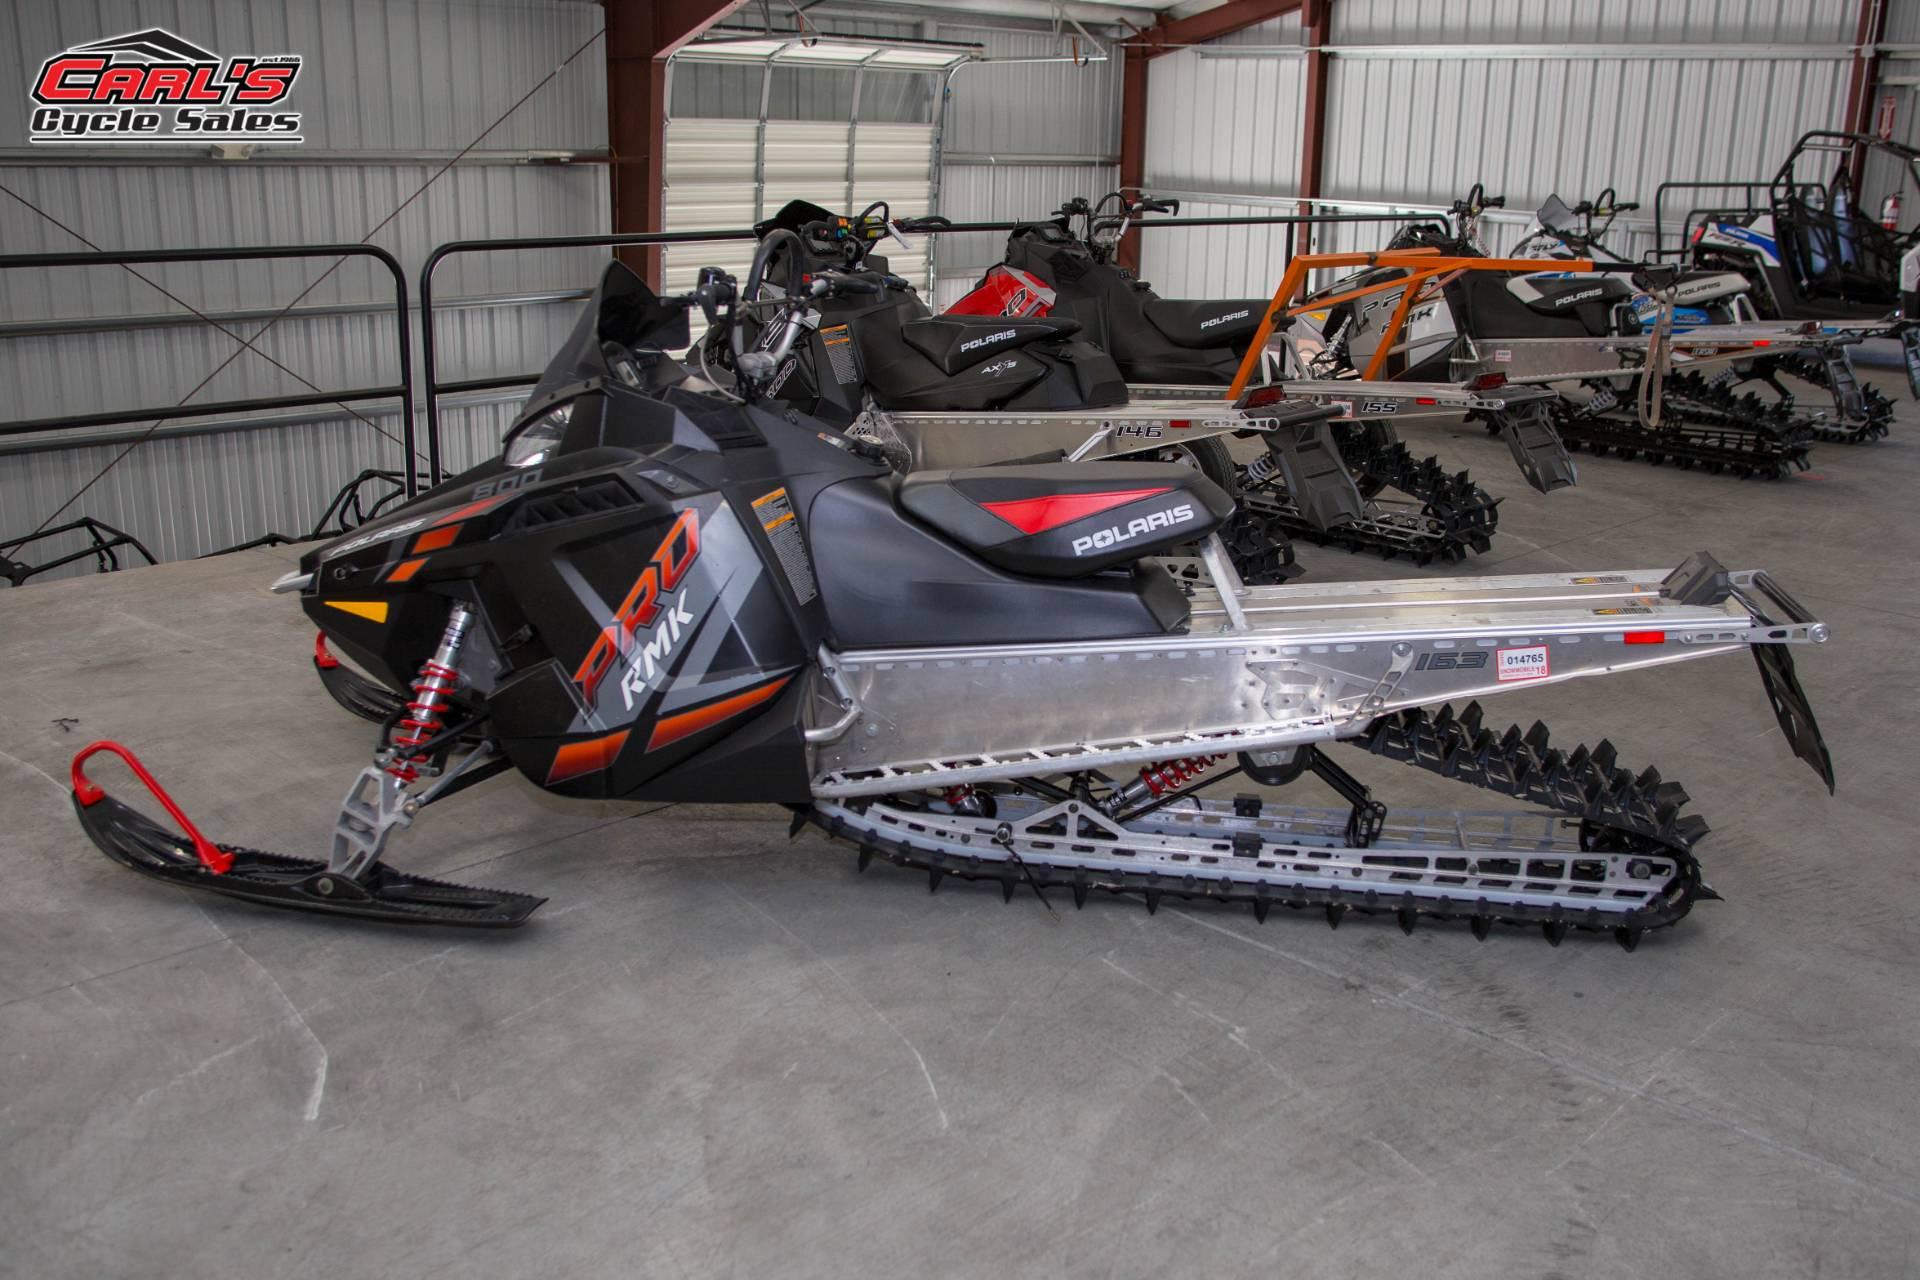 2015 800 Pro-RMK 163